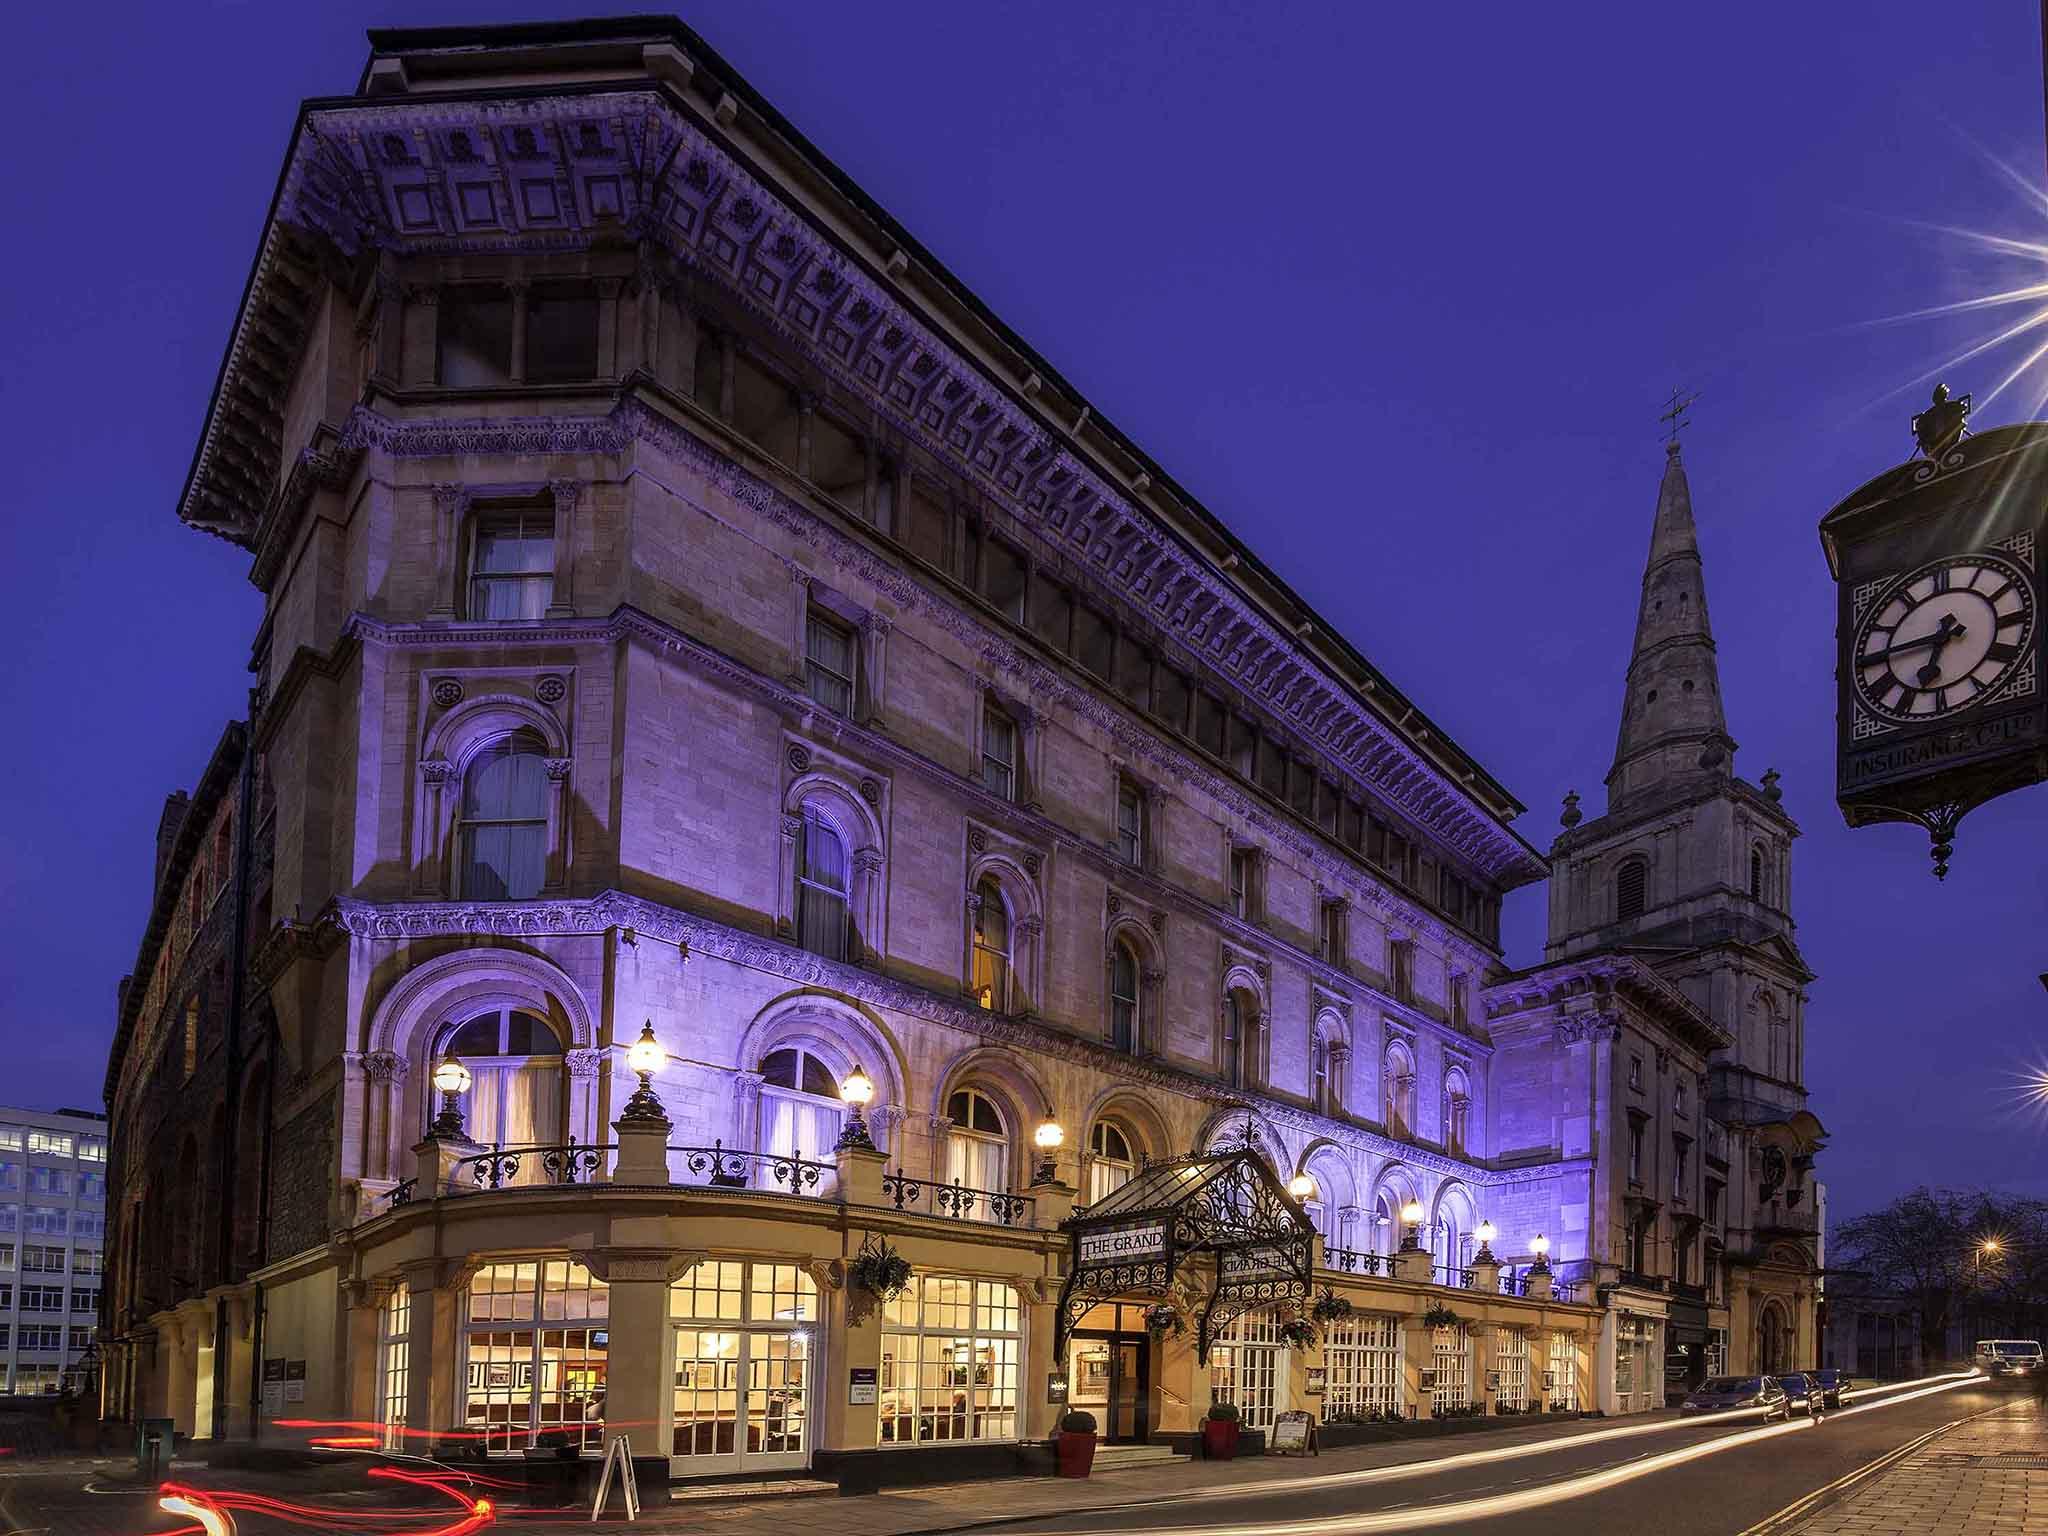 Hotel – Mercure Bristol Grand Hotel (recém-reformado)